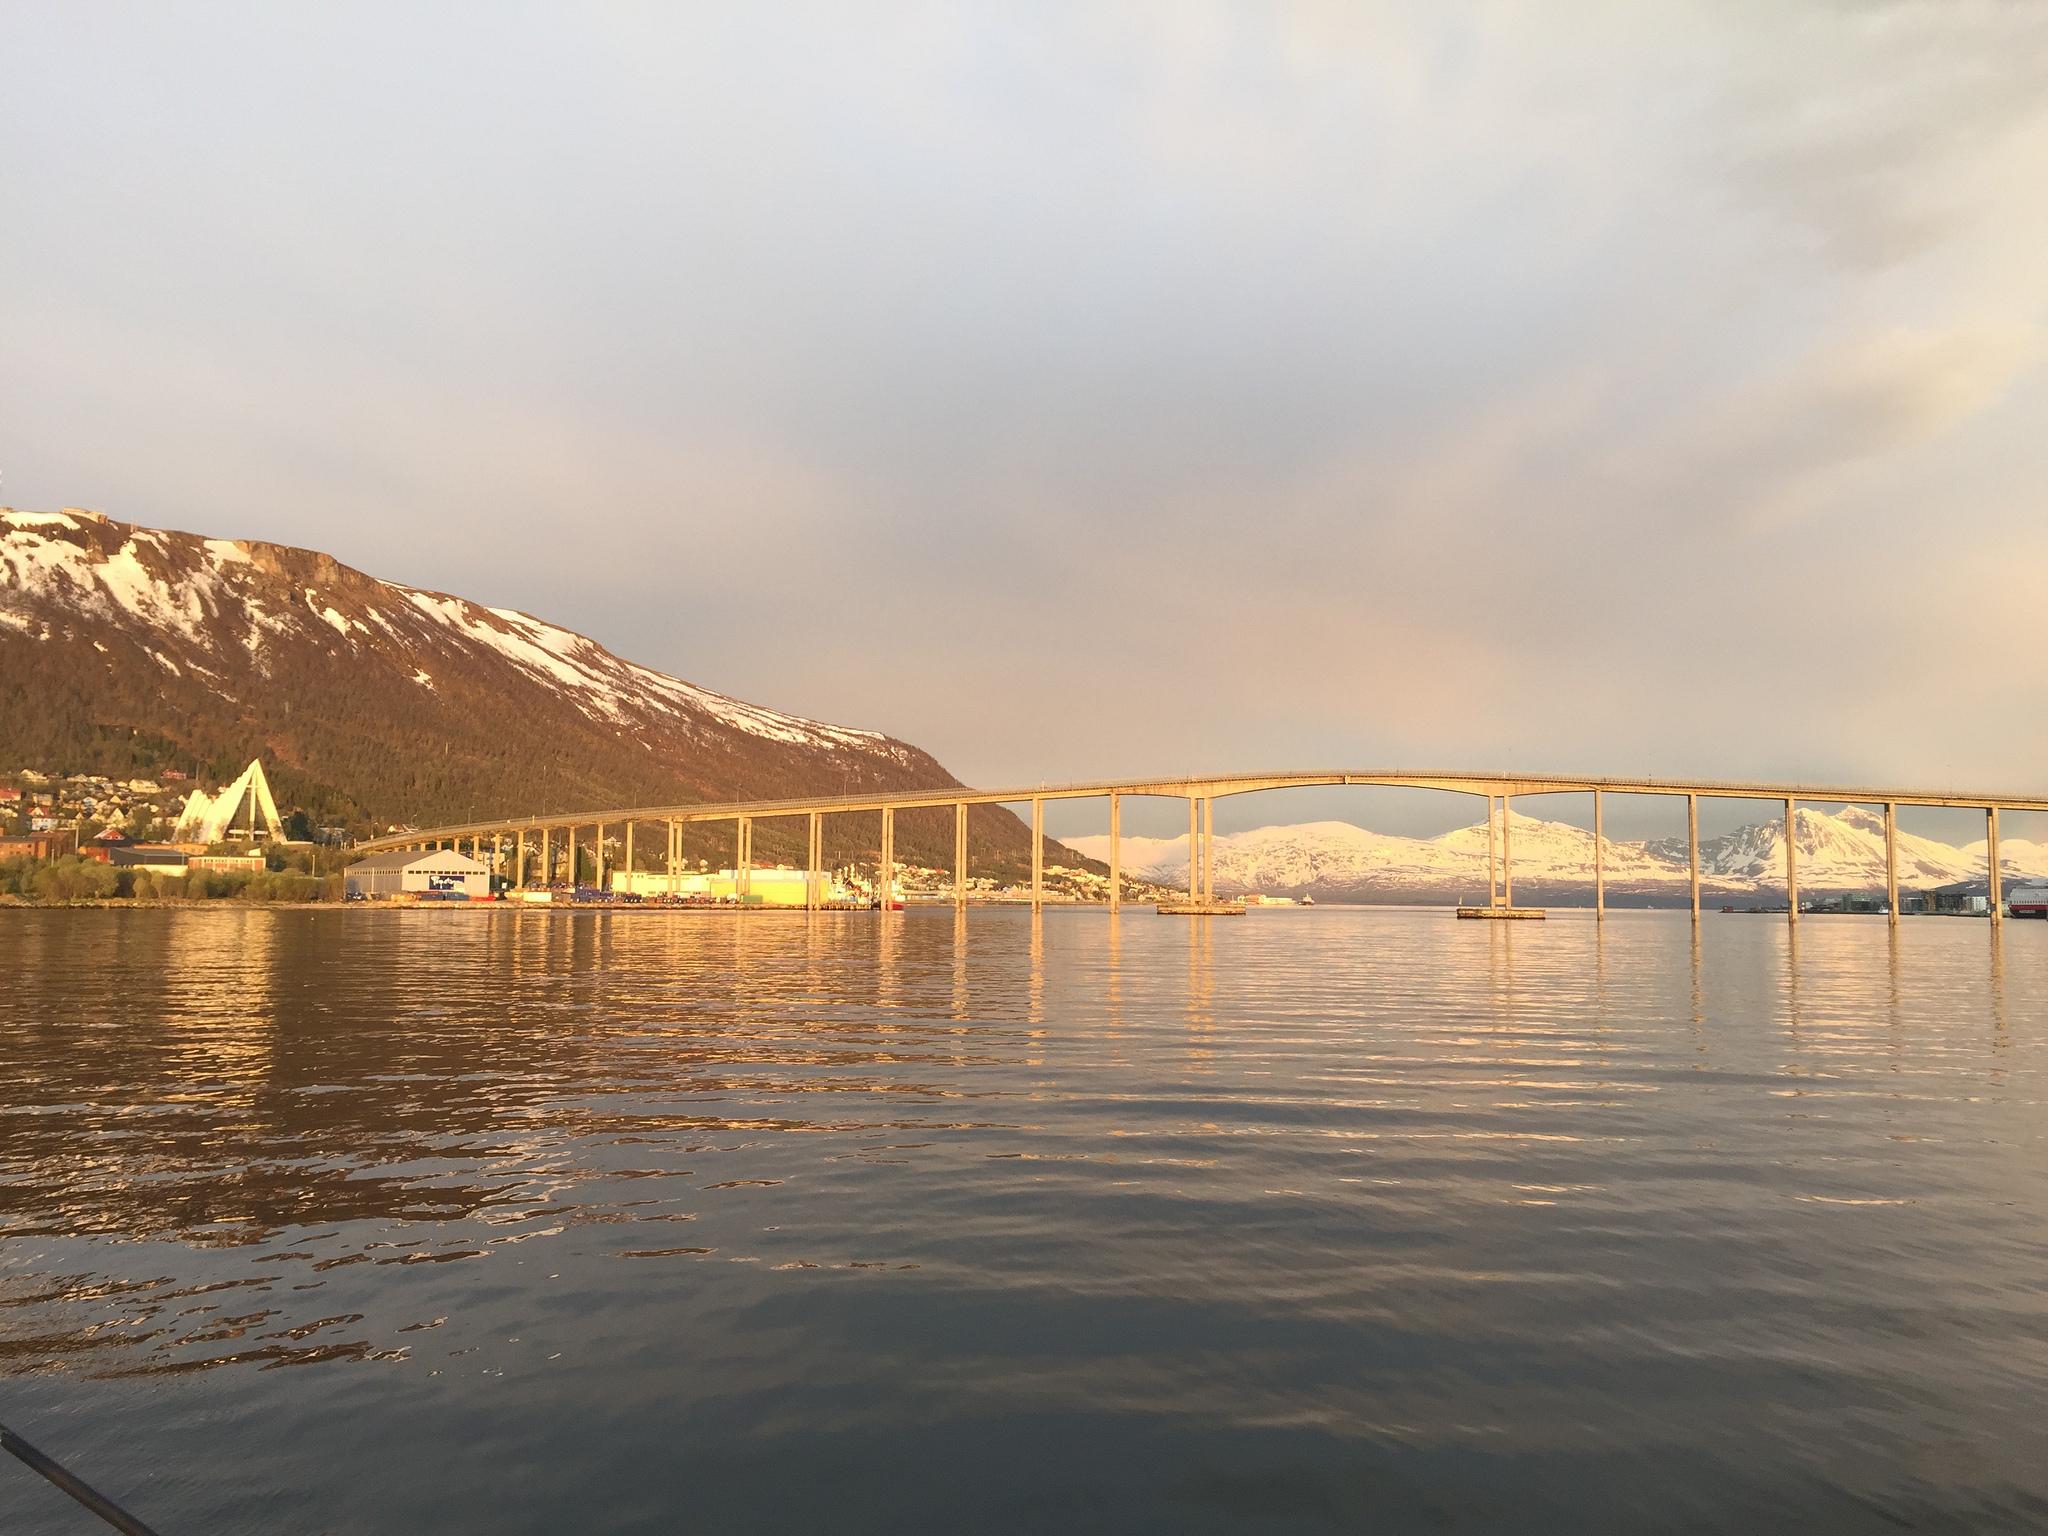 #midnightsun | Tromso | Arctic Princess | Bridge